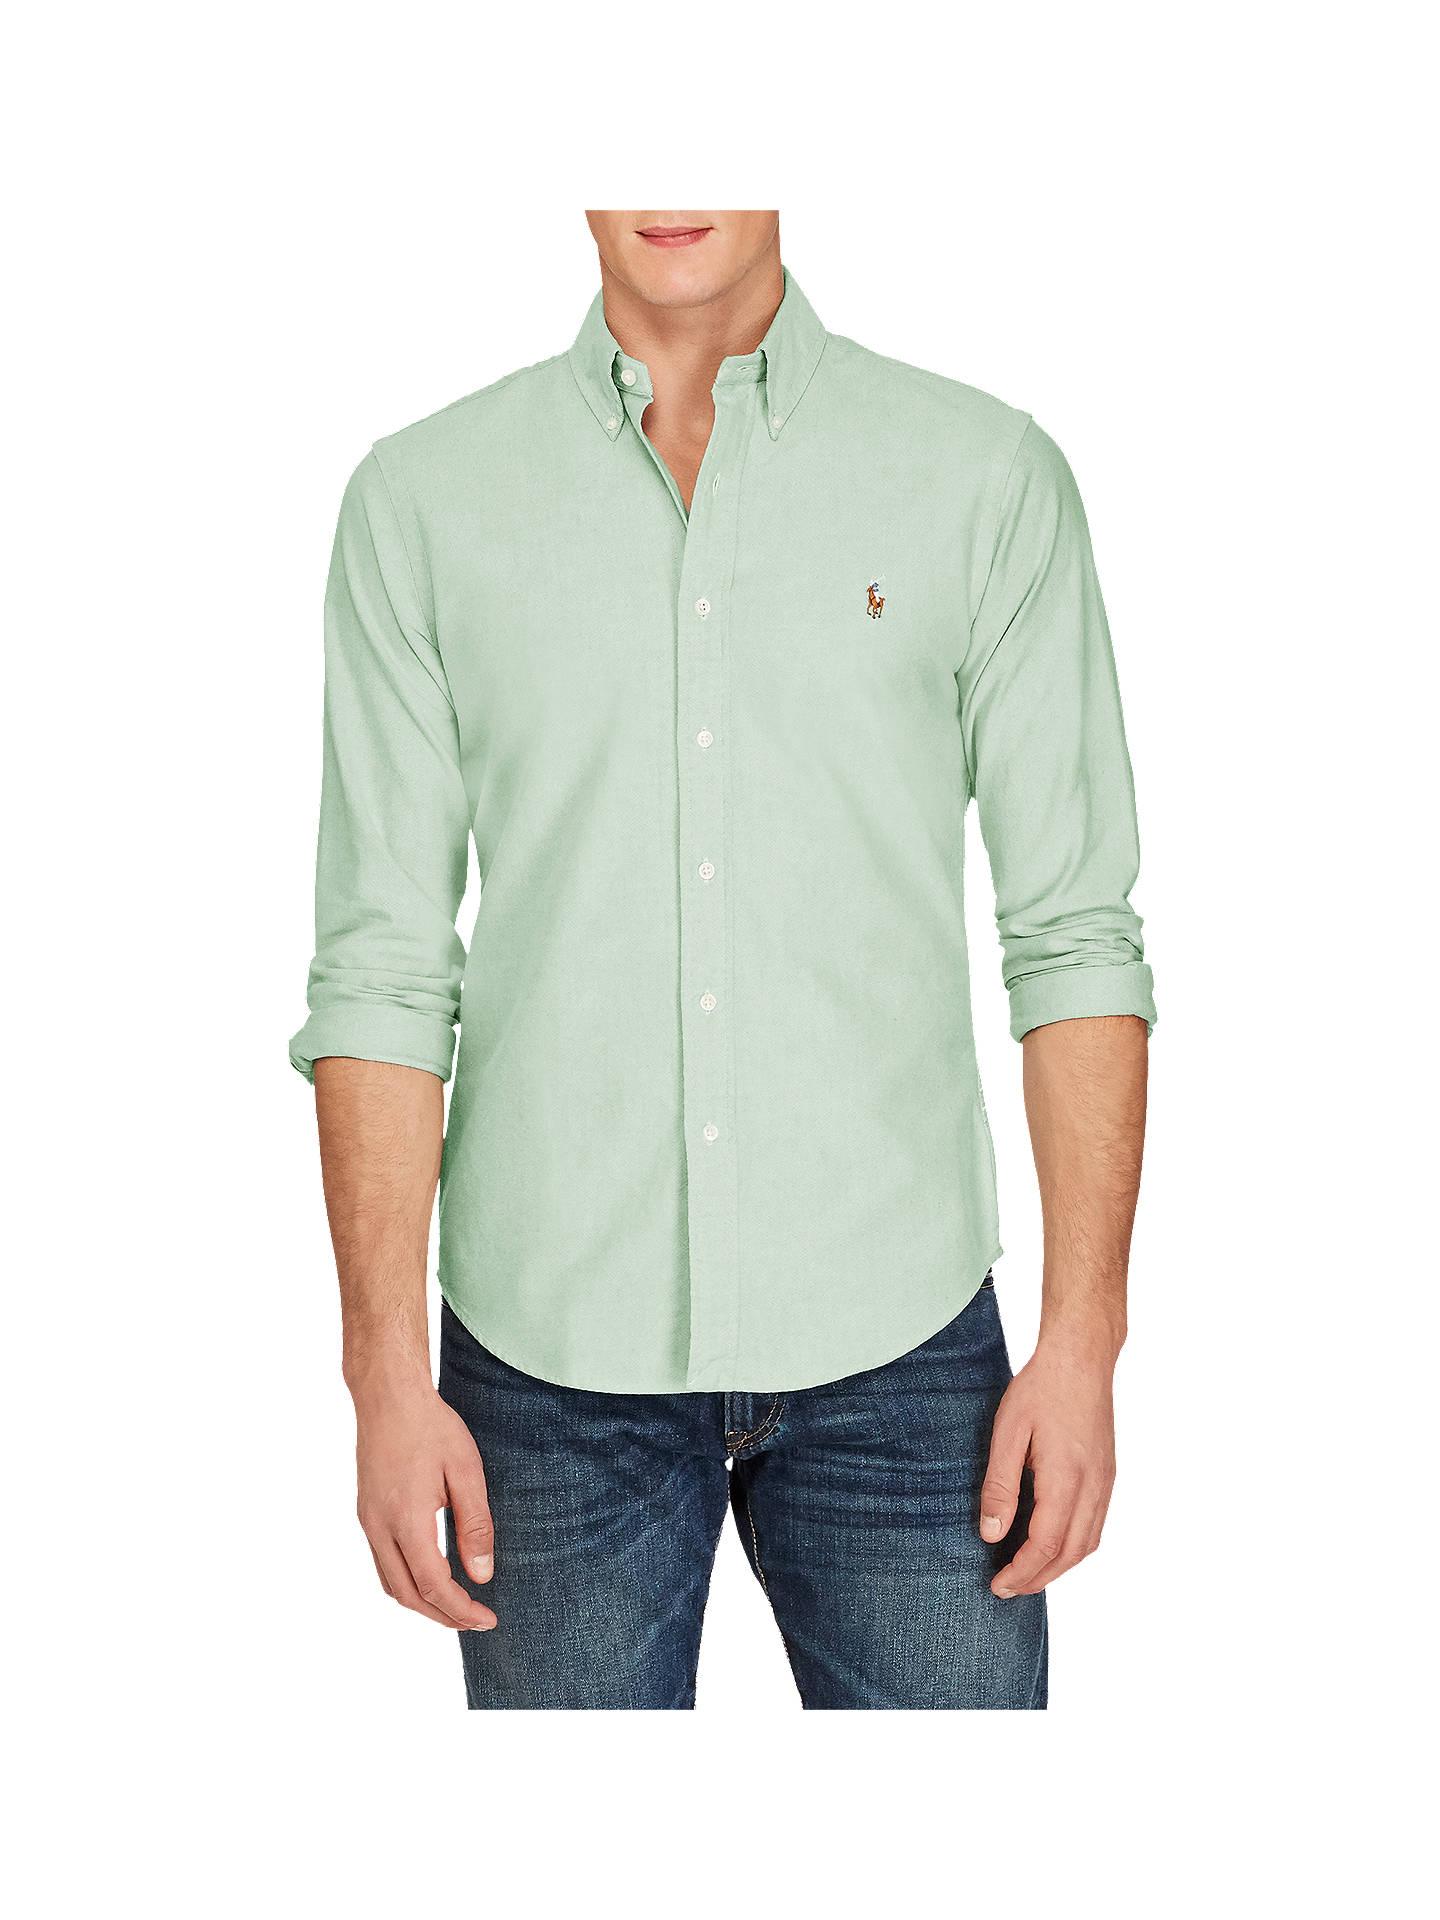 e06b15d9a071 Polo Ralph Lauren Cotton Oxford Shirt at John Lewis   Partners